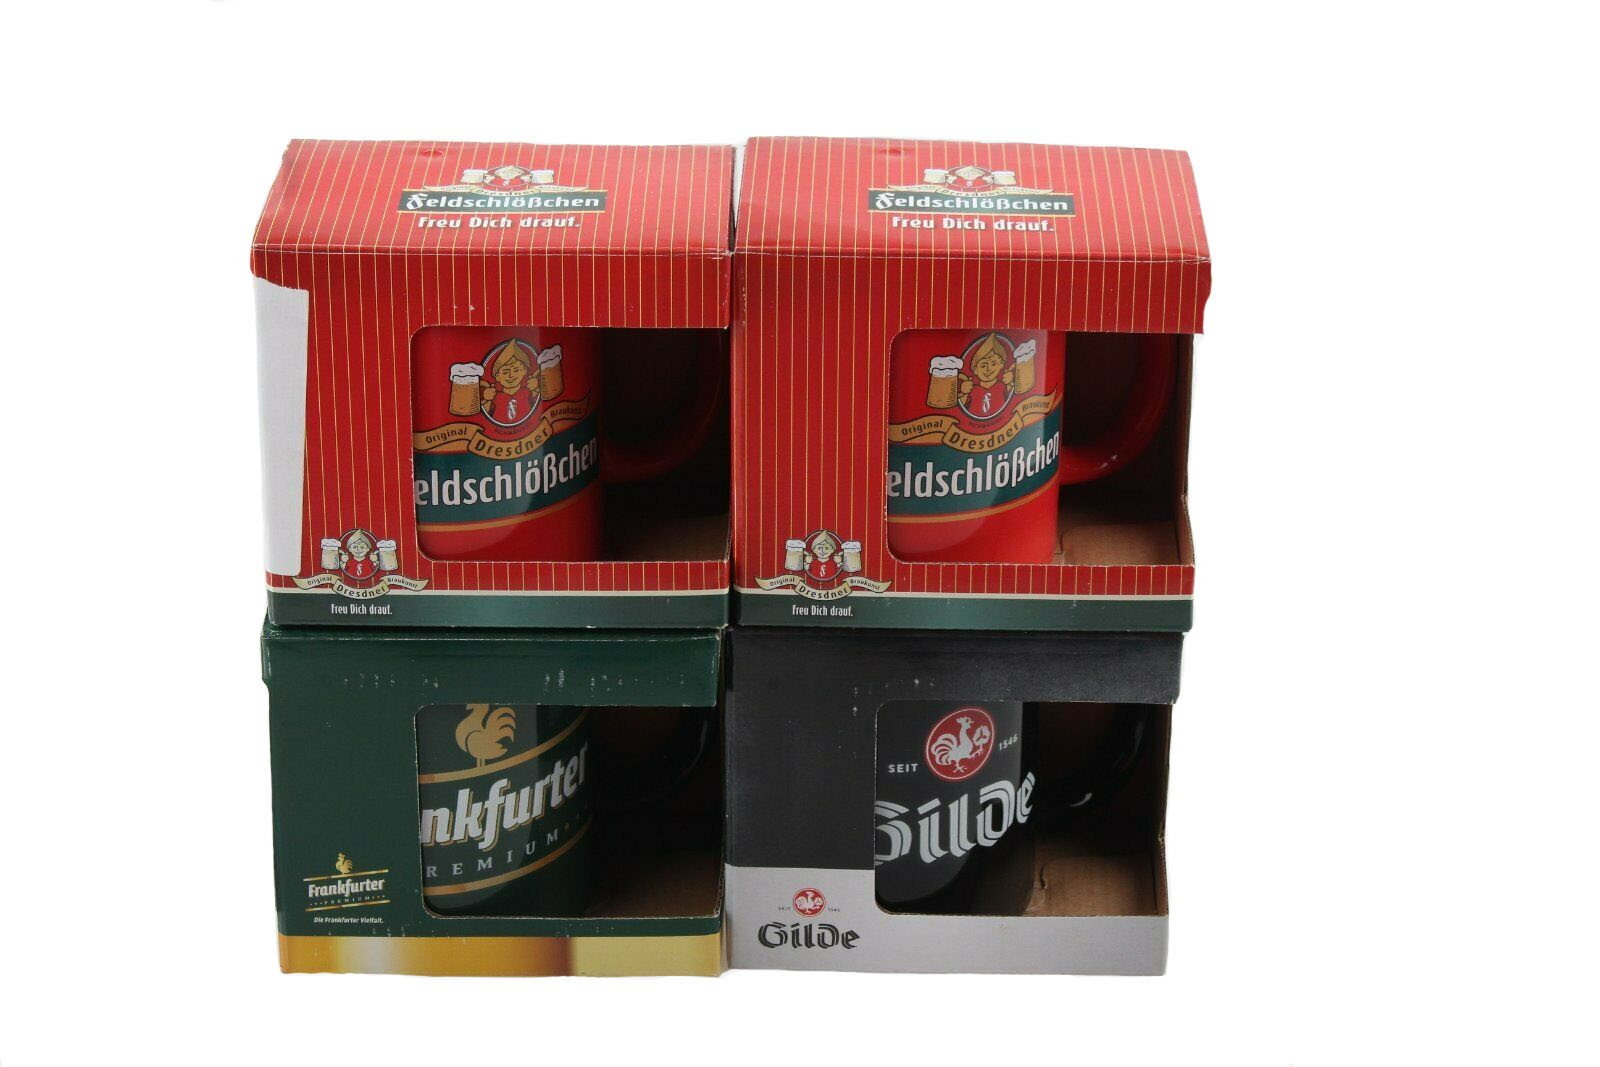 Branded Beer Mugs, 2 Est. Original Retail €19,800, Tanna, DE